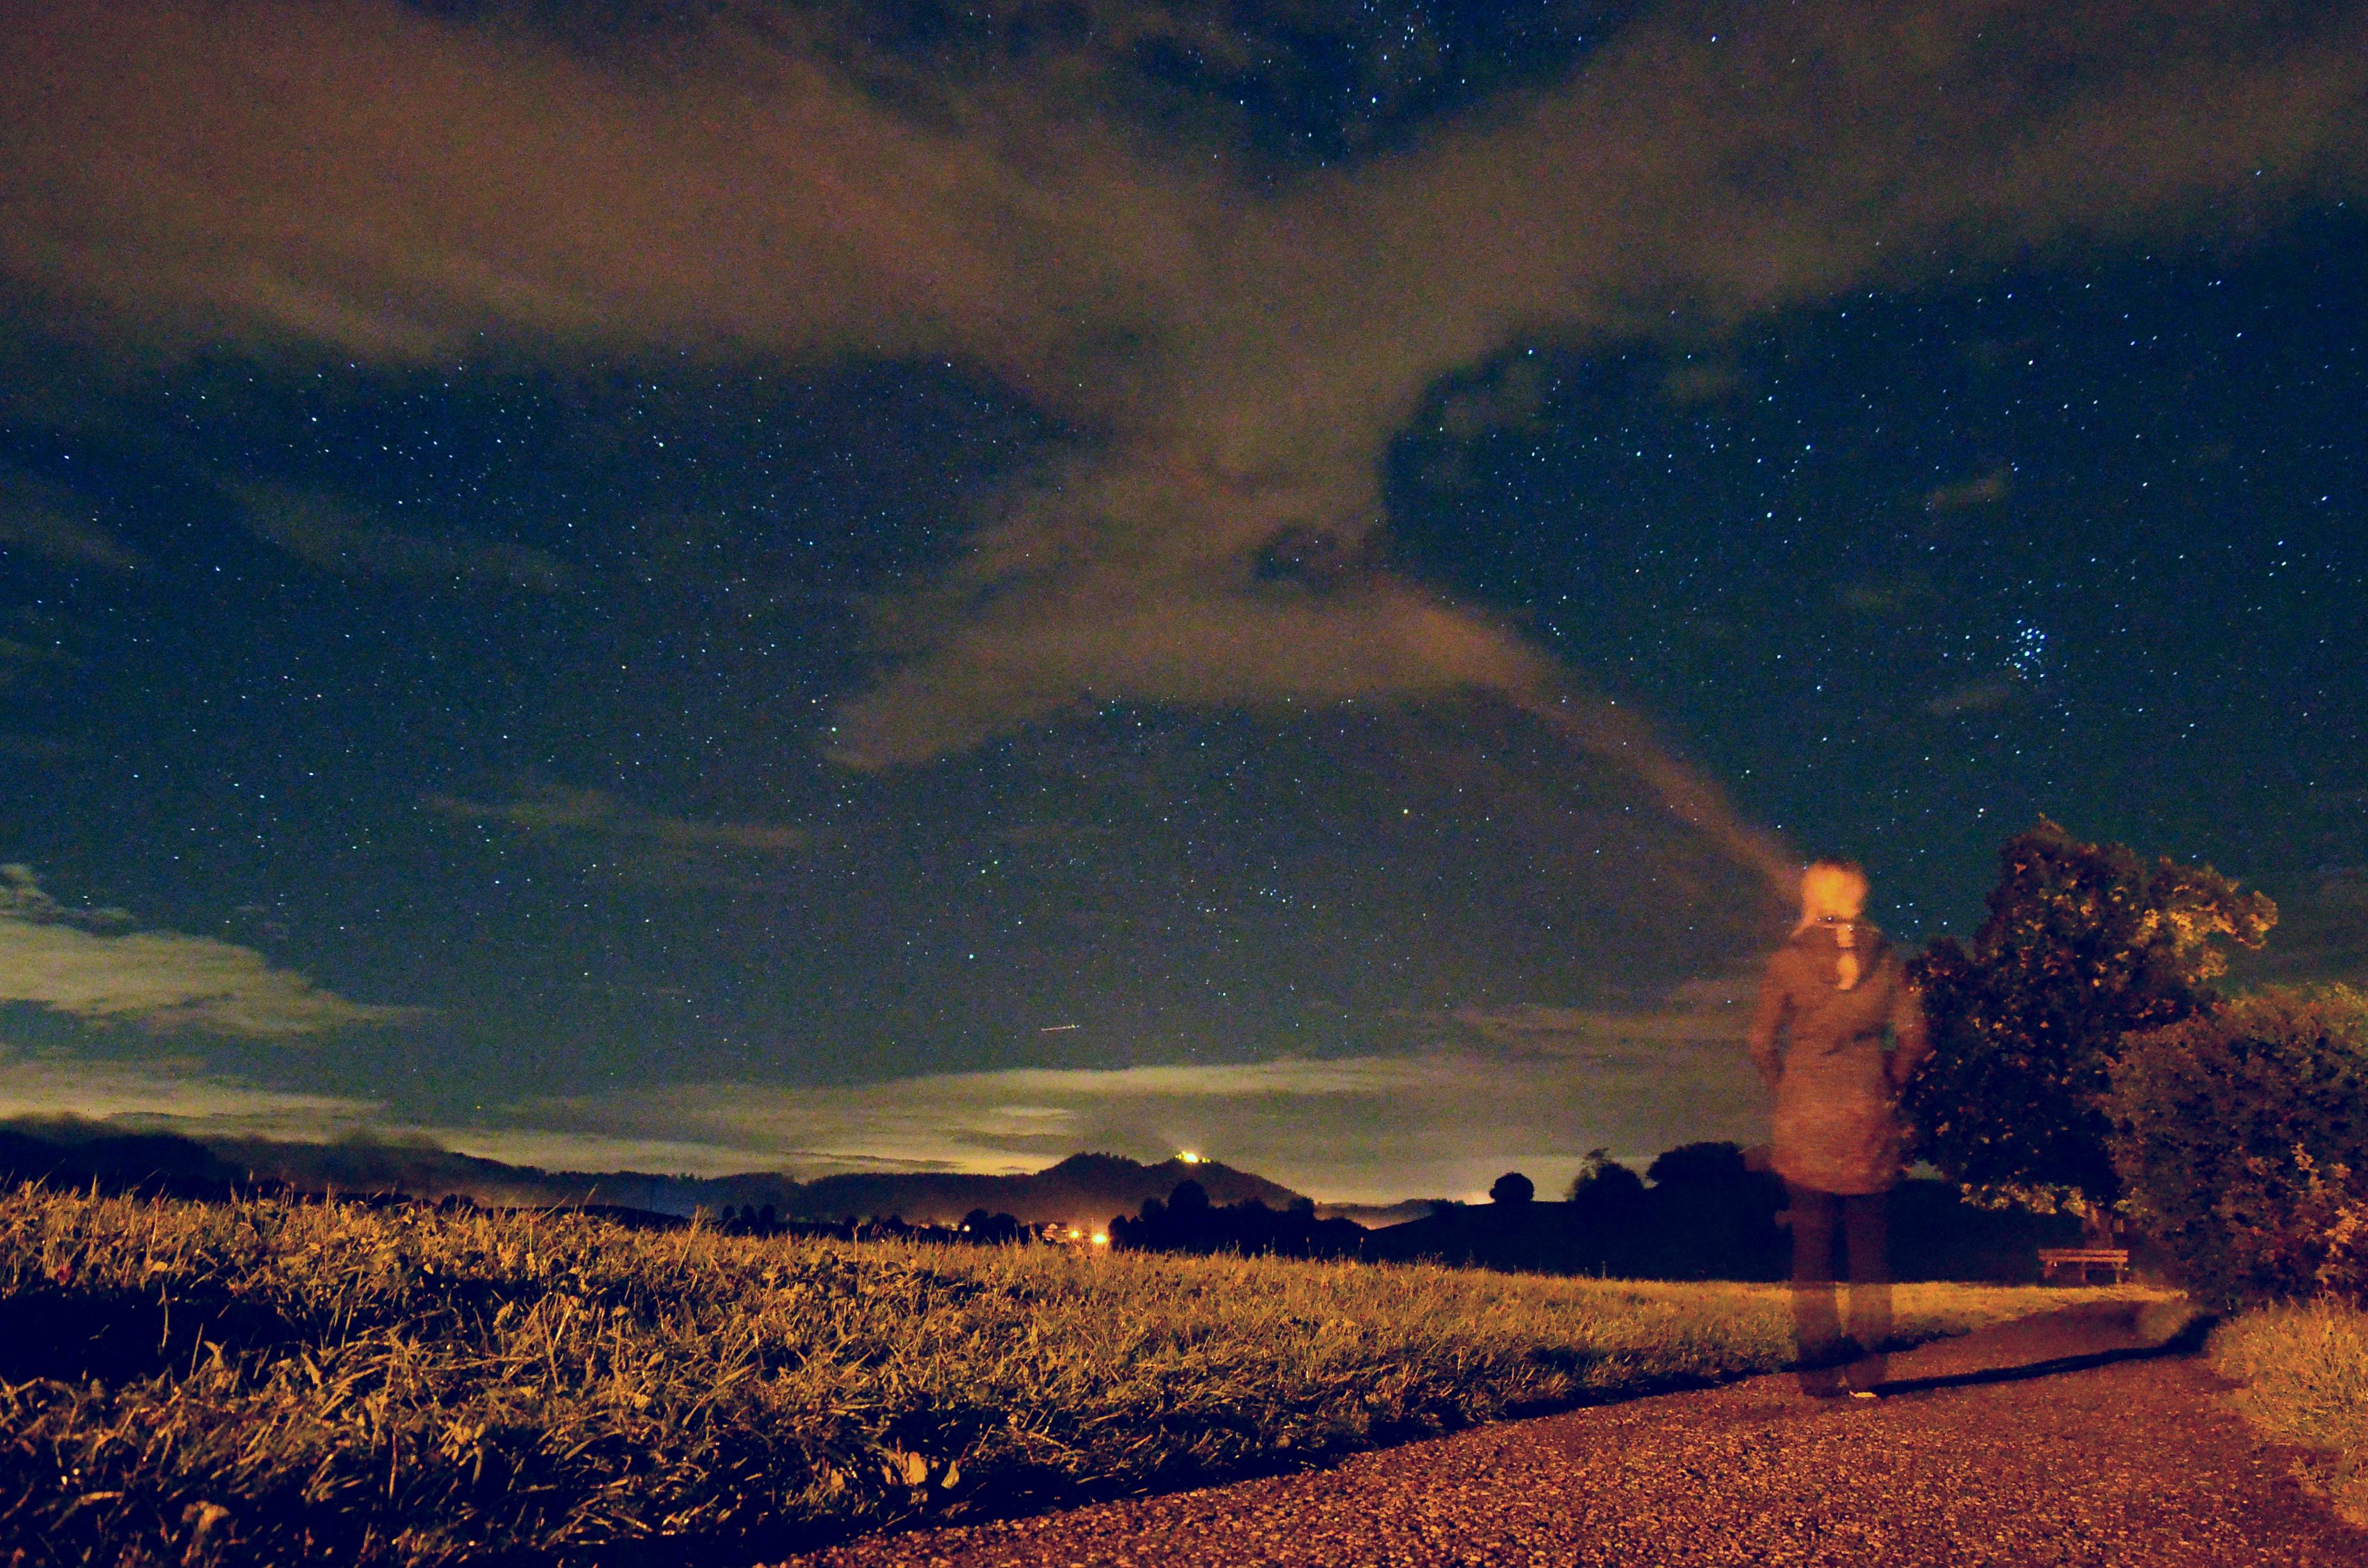 O0080 Wandern unterm Sternenhimmel Pfronten-Halden.jpg